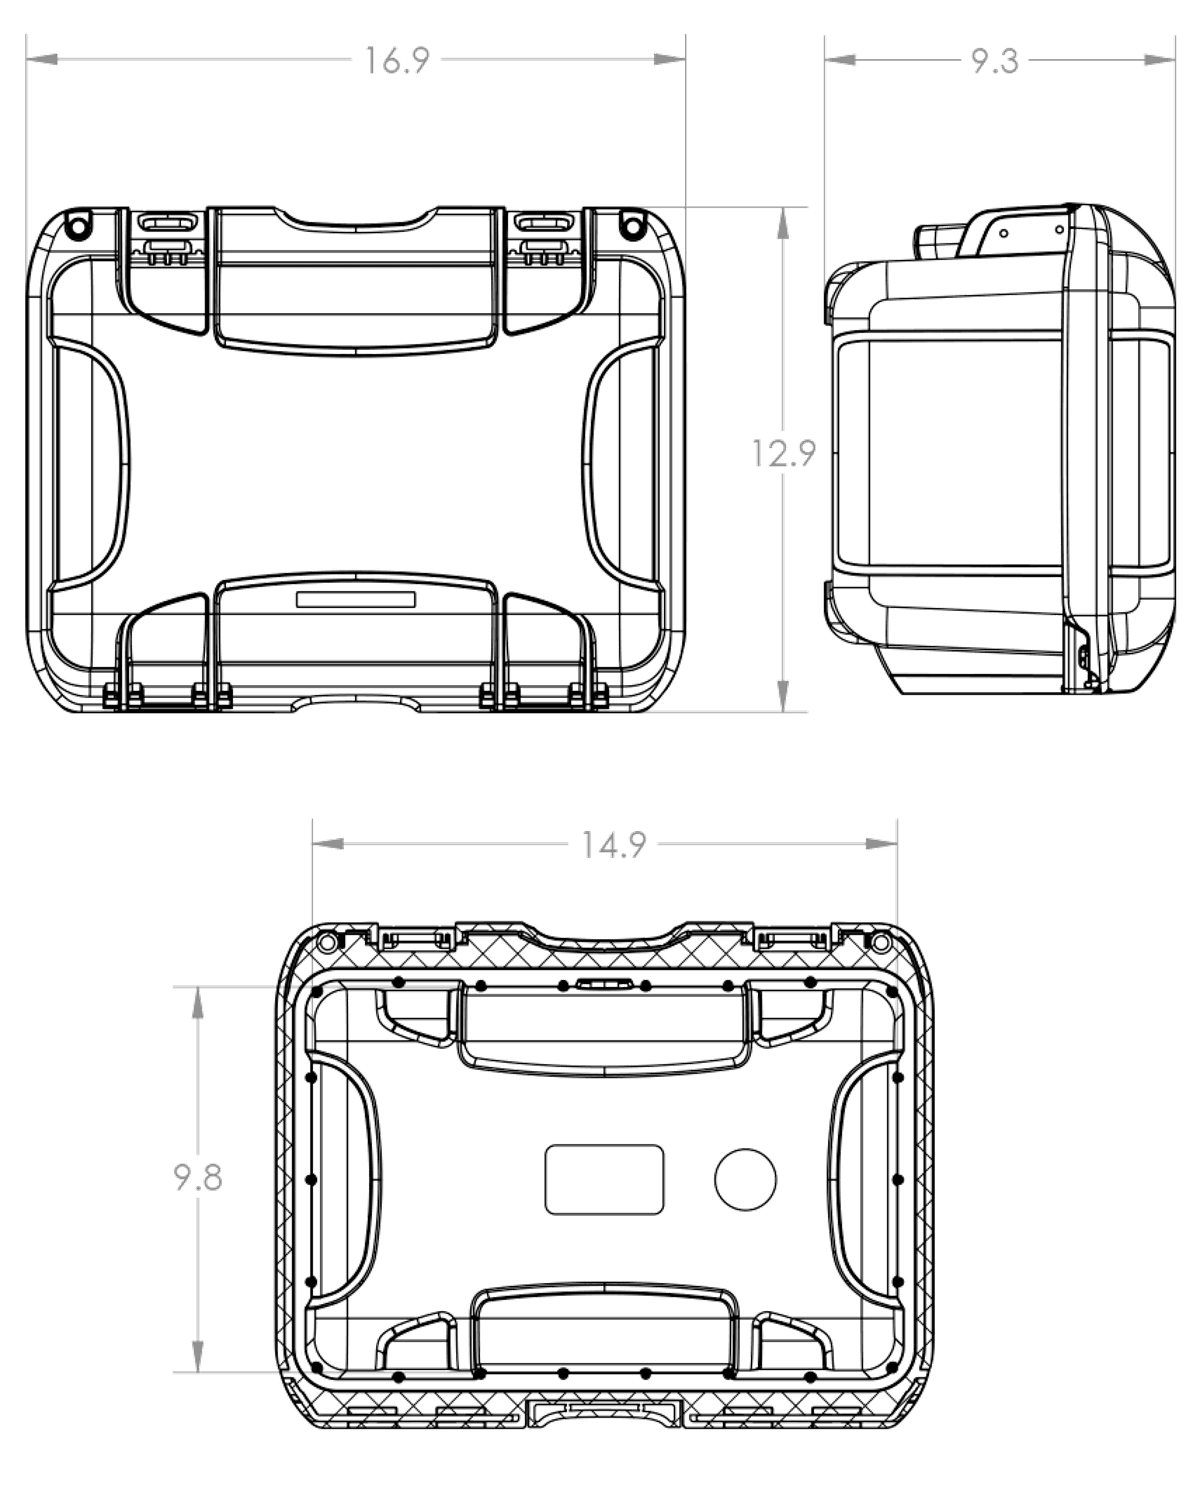 Dimensions of the Nanuk 918 DJI Goggles Case Hard Case